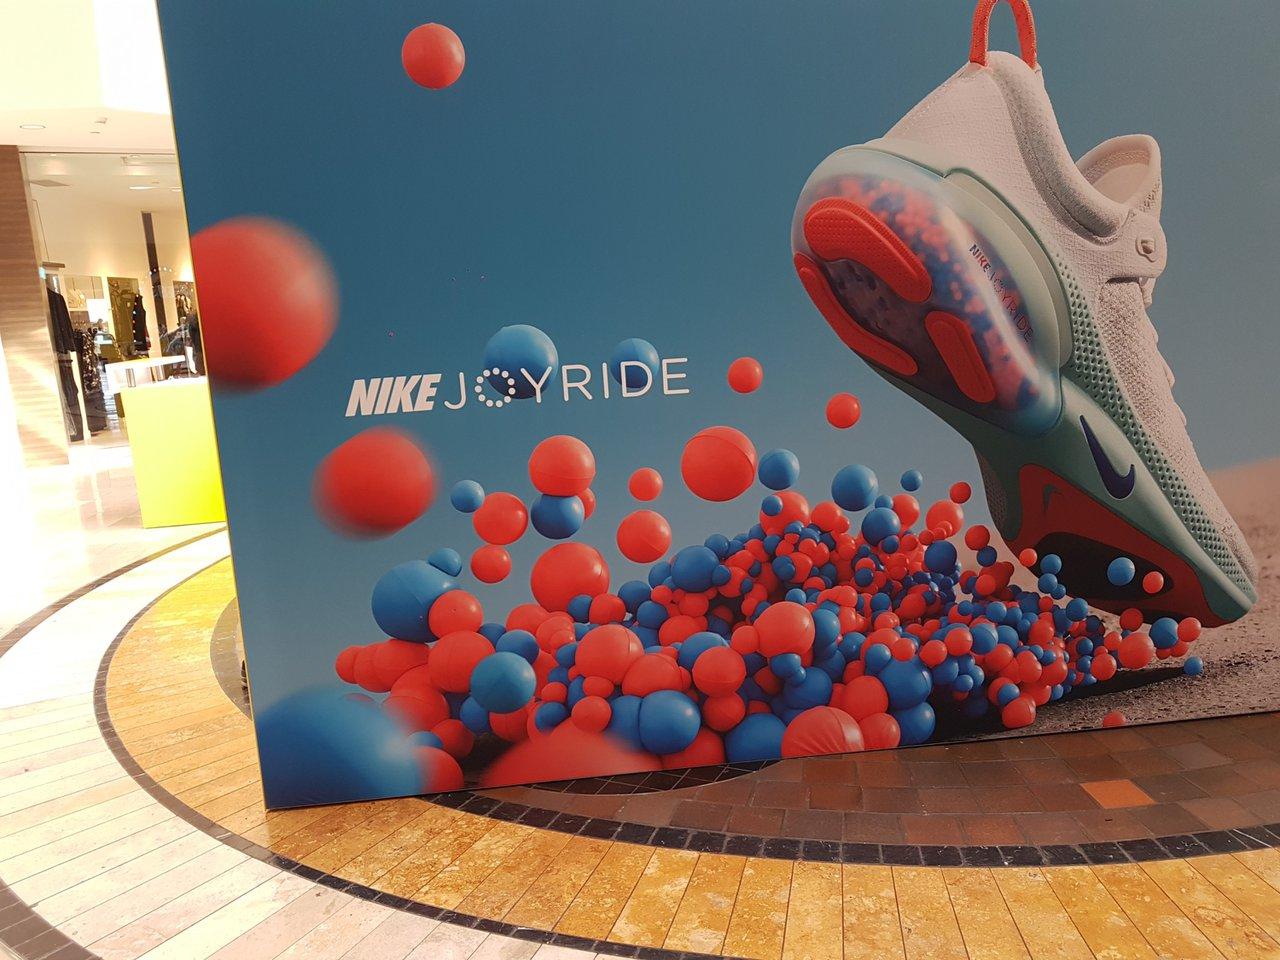 Nike Treadmill photo DJI_20190815_094650.jpg